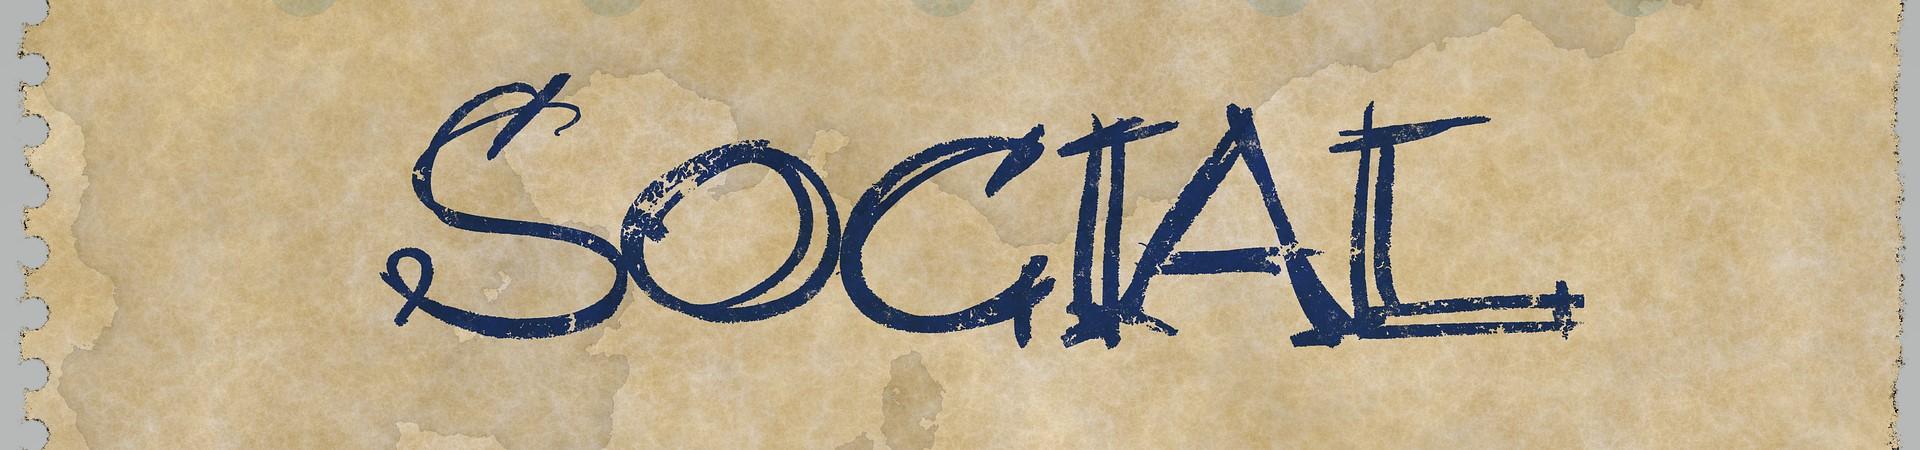 Social written on paper